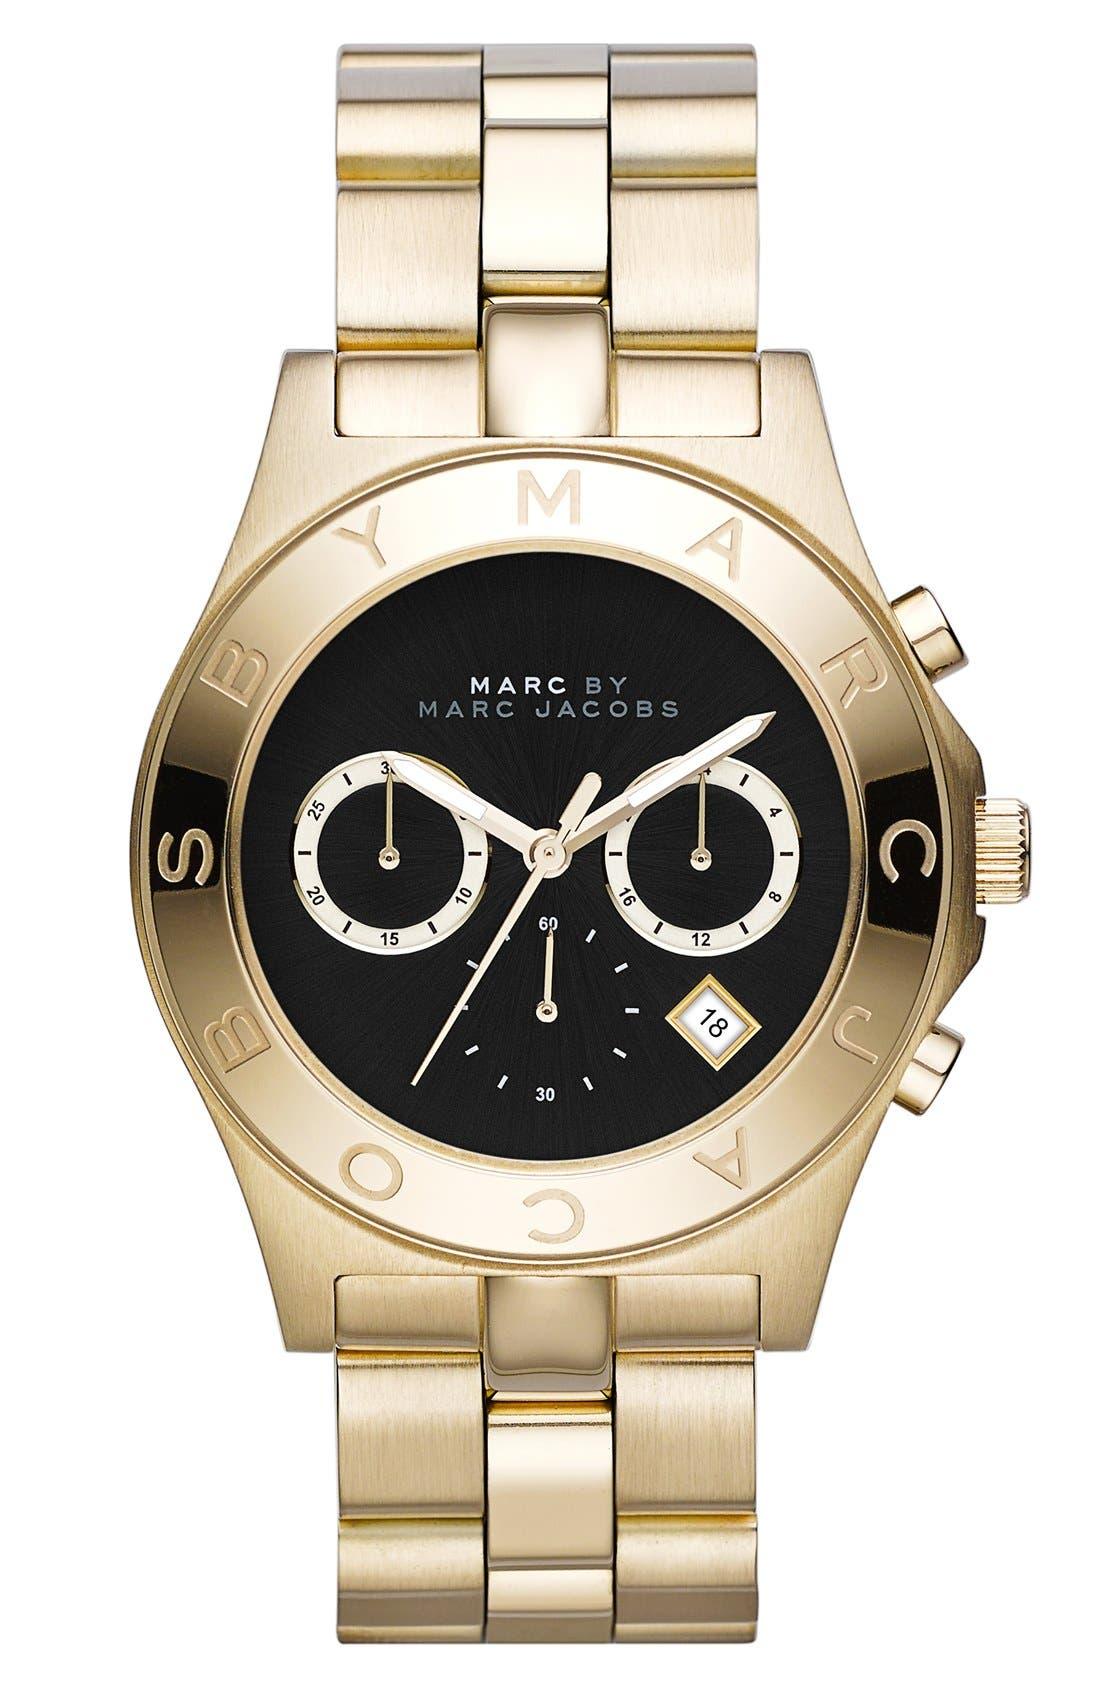 Main Image - MARC JACOBS 'Blade' Chronograph Bracelet Watch, 40mm